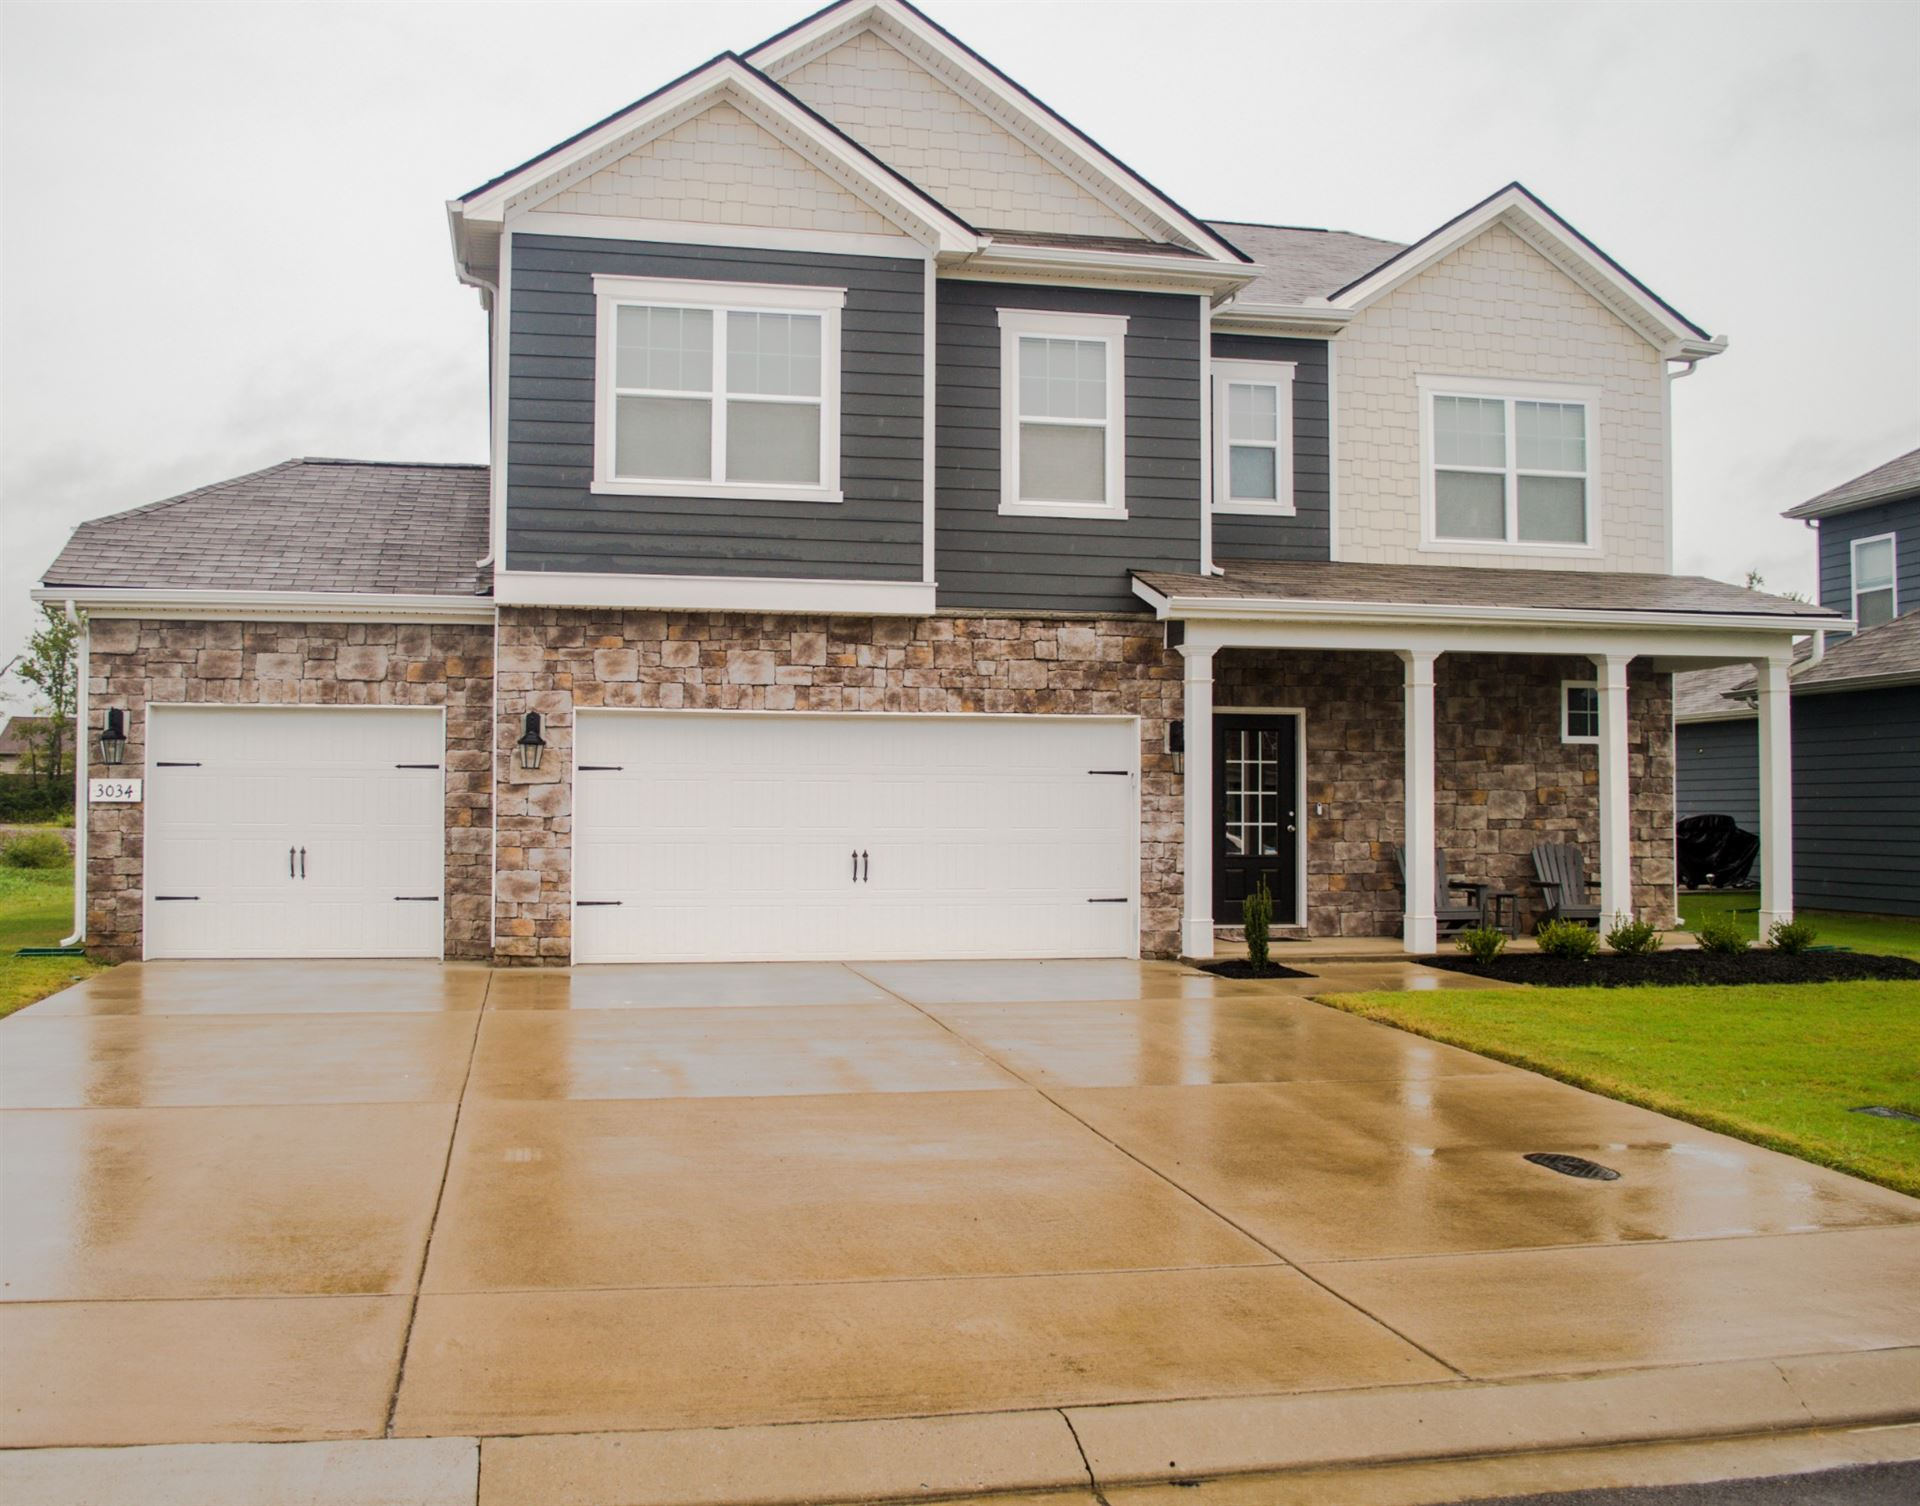 3034 Butterfield Ave, Murfreesboro, TN 37128 - MLS#: 2291780